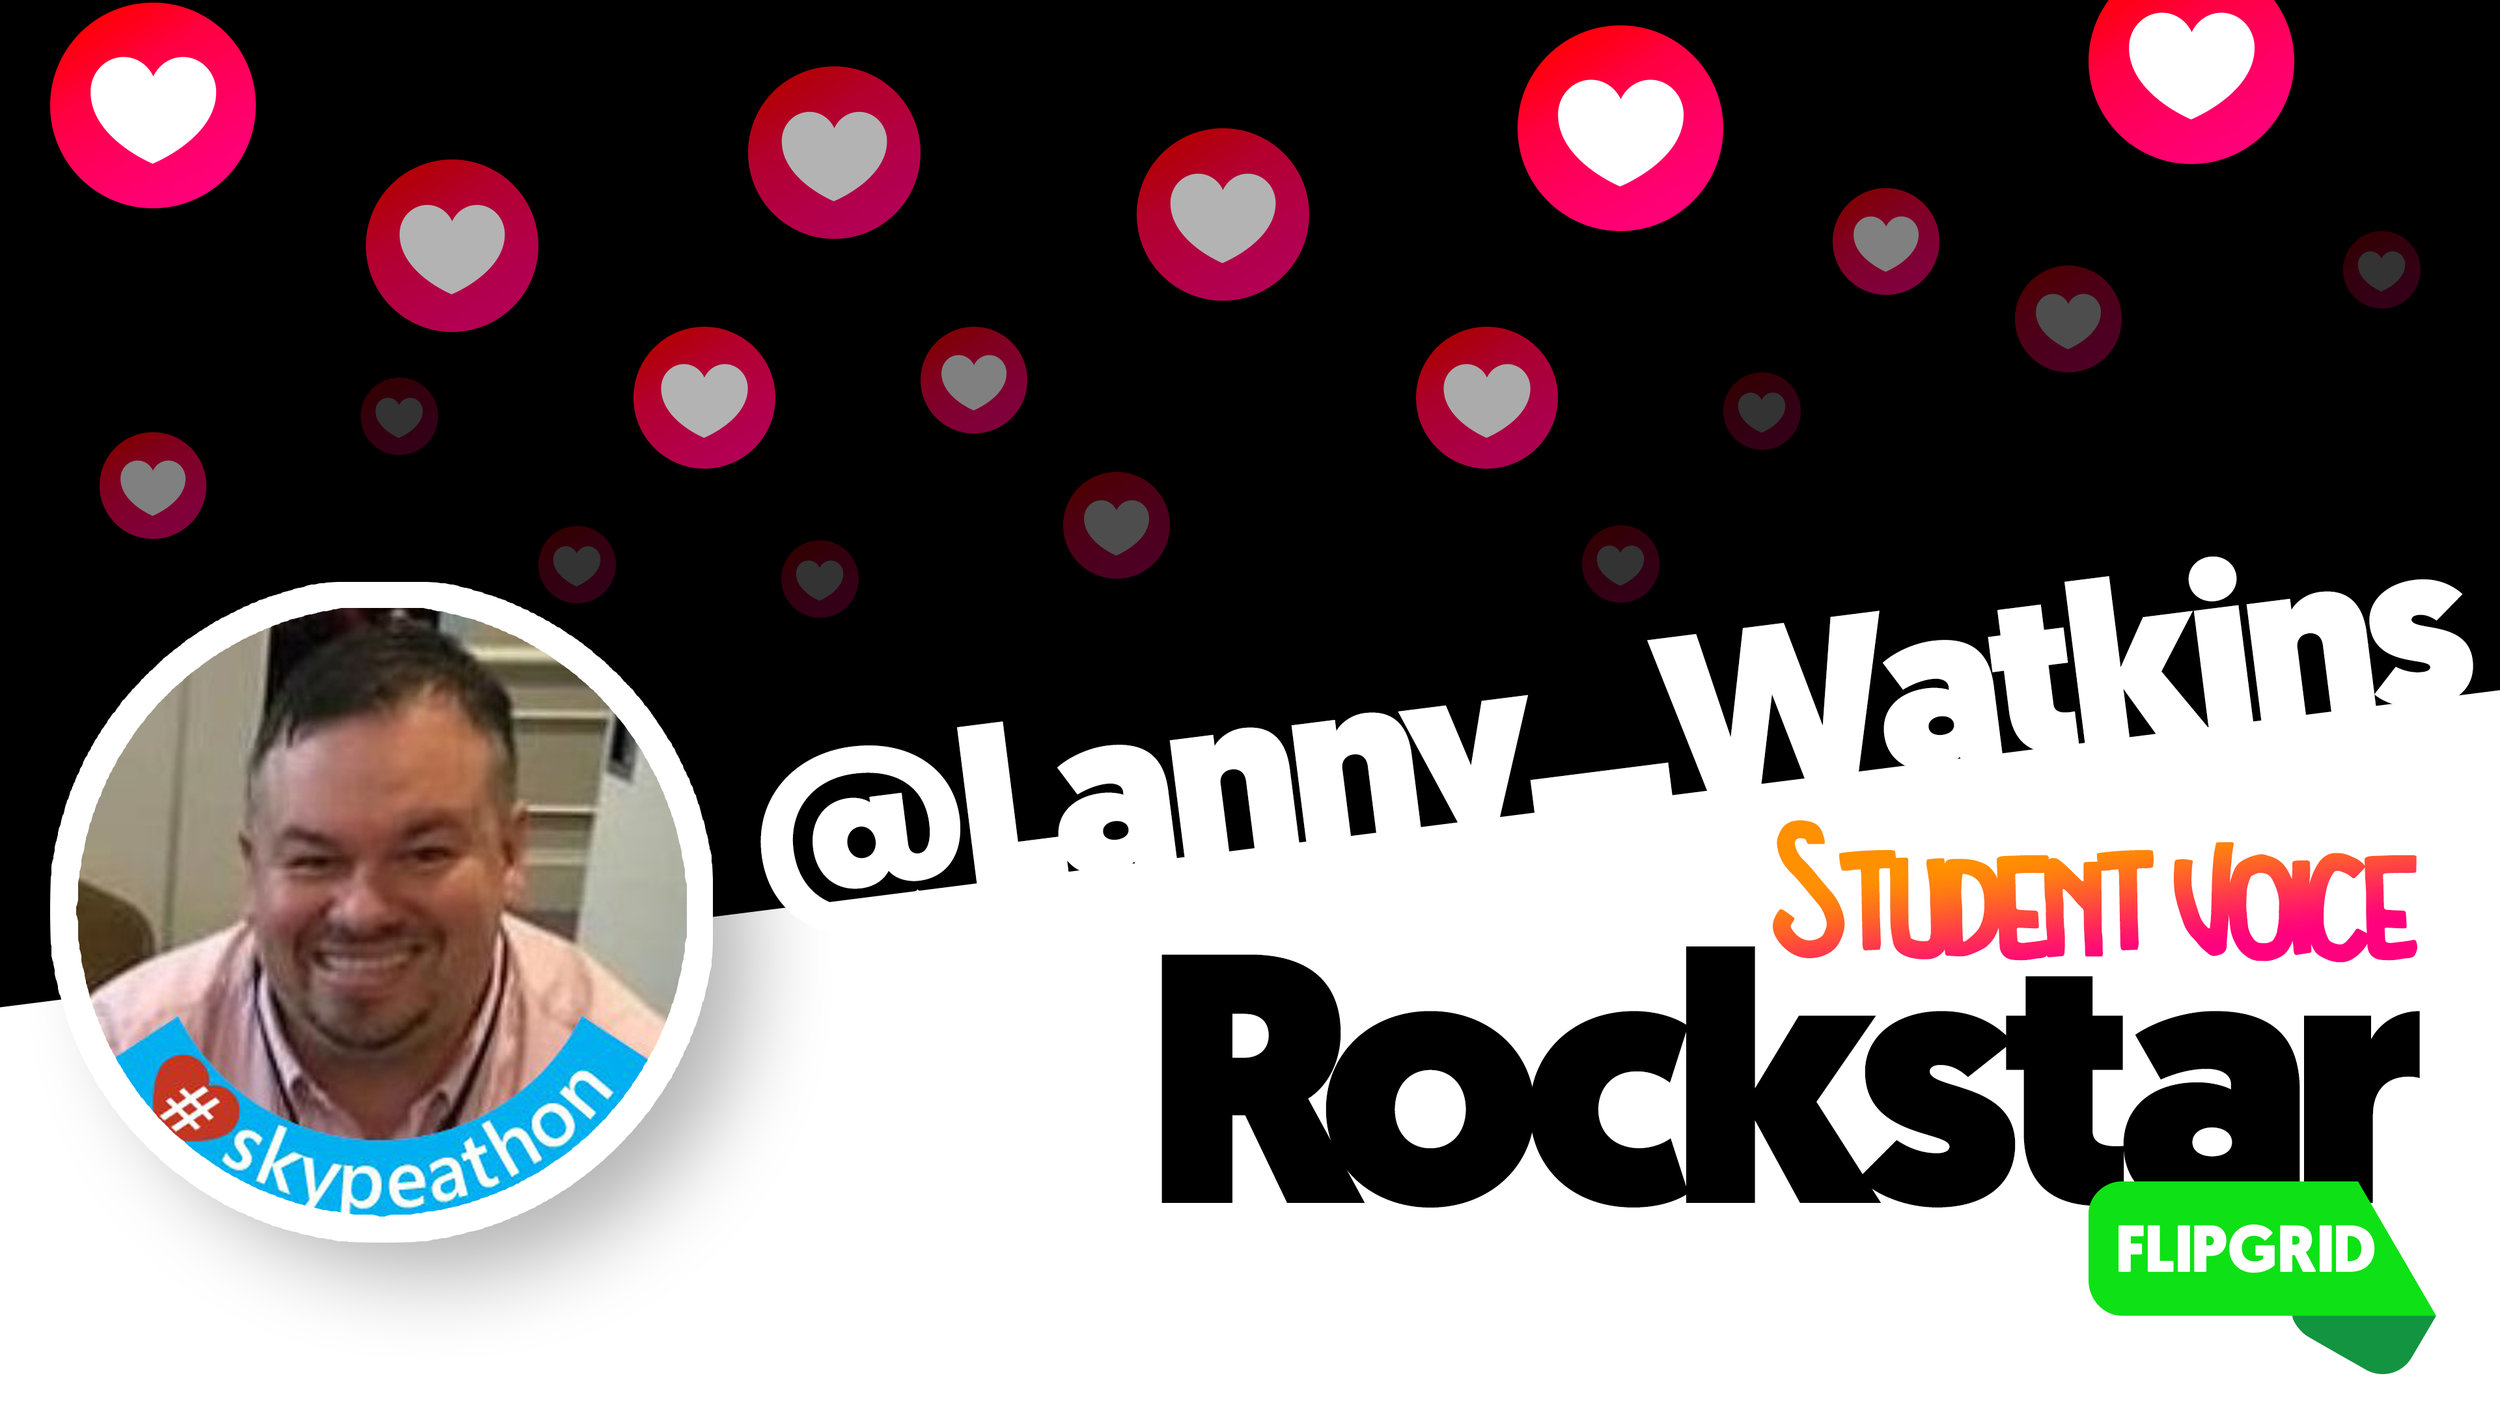 LannyWatkins_Rockstar.jpg